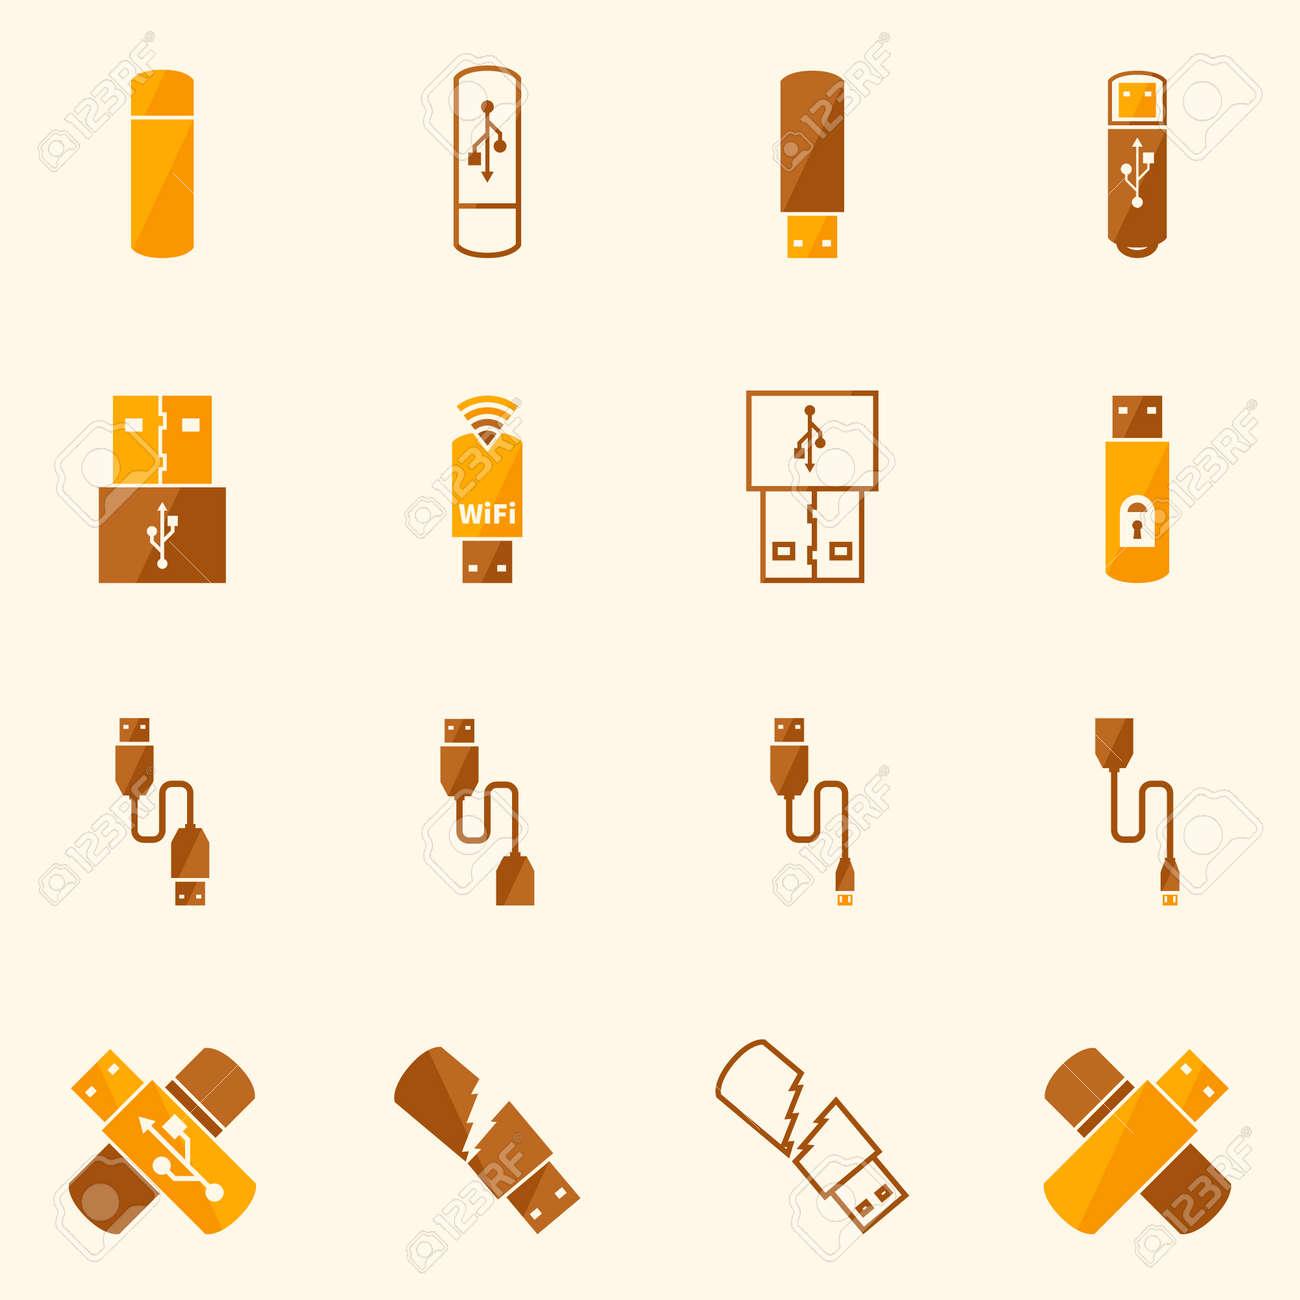 Usb Icons Flat Yellow Set Vector Usb Flash Otg And Micro Cable